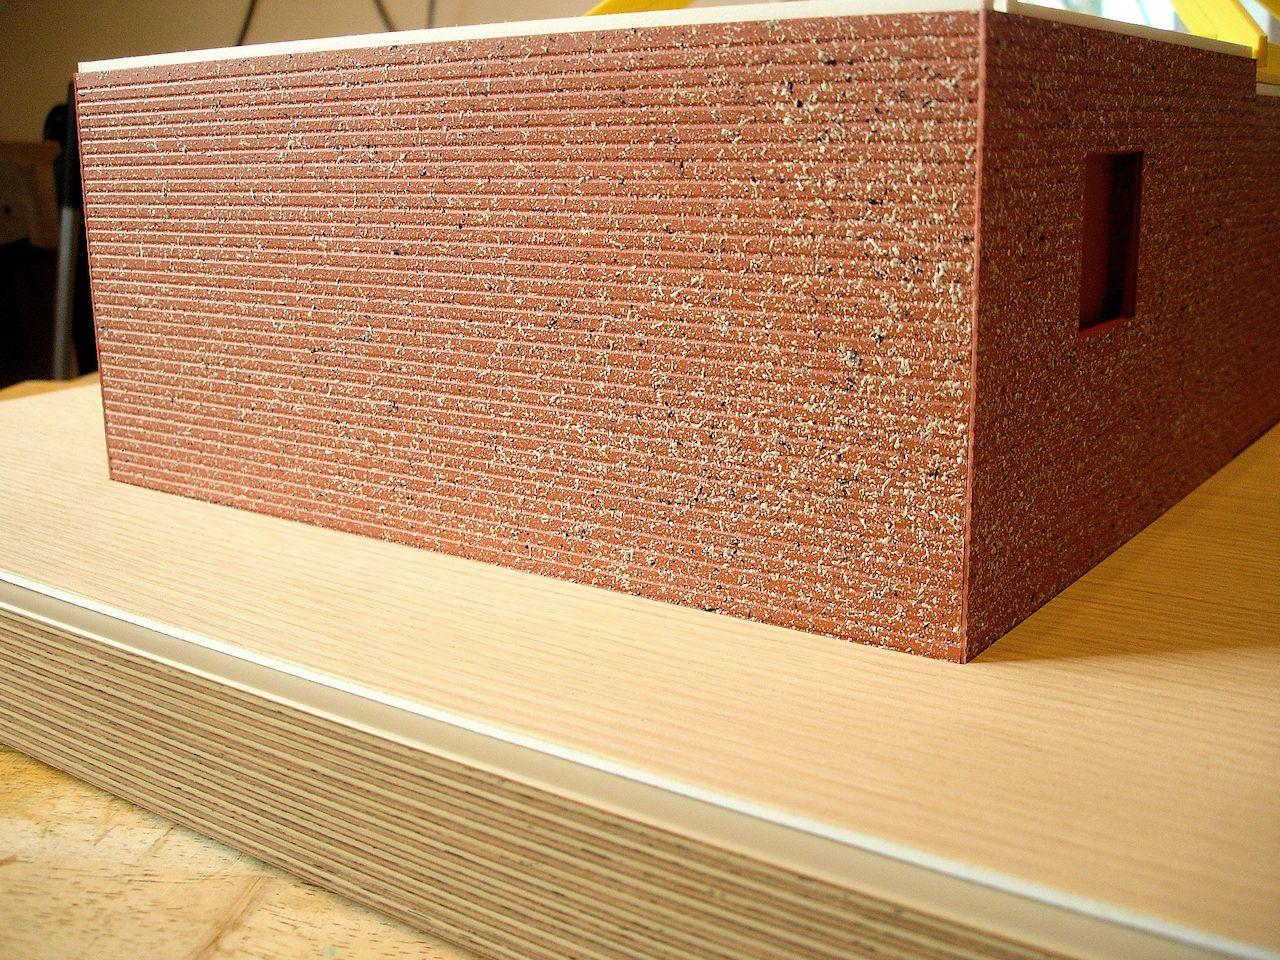 David Neat model-maker, archetectural model 2018, brickwork effect